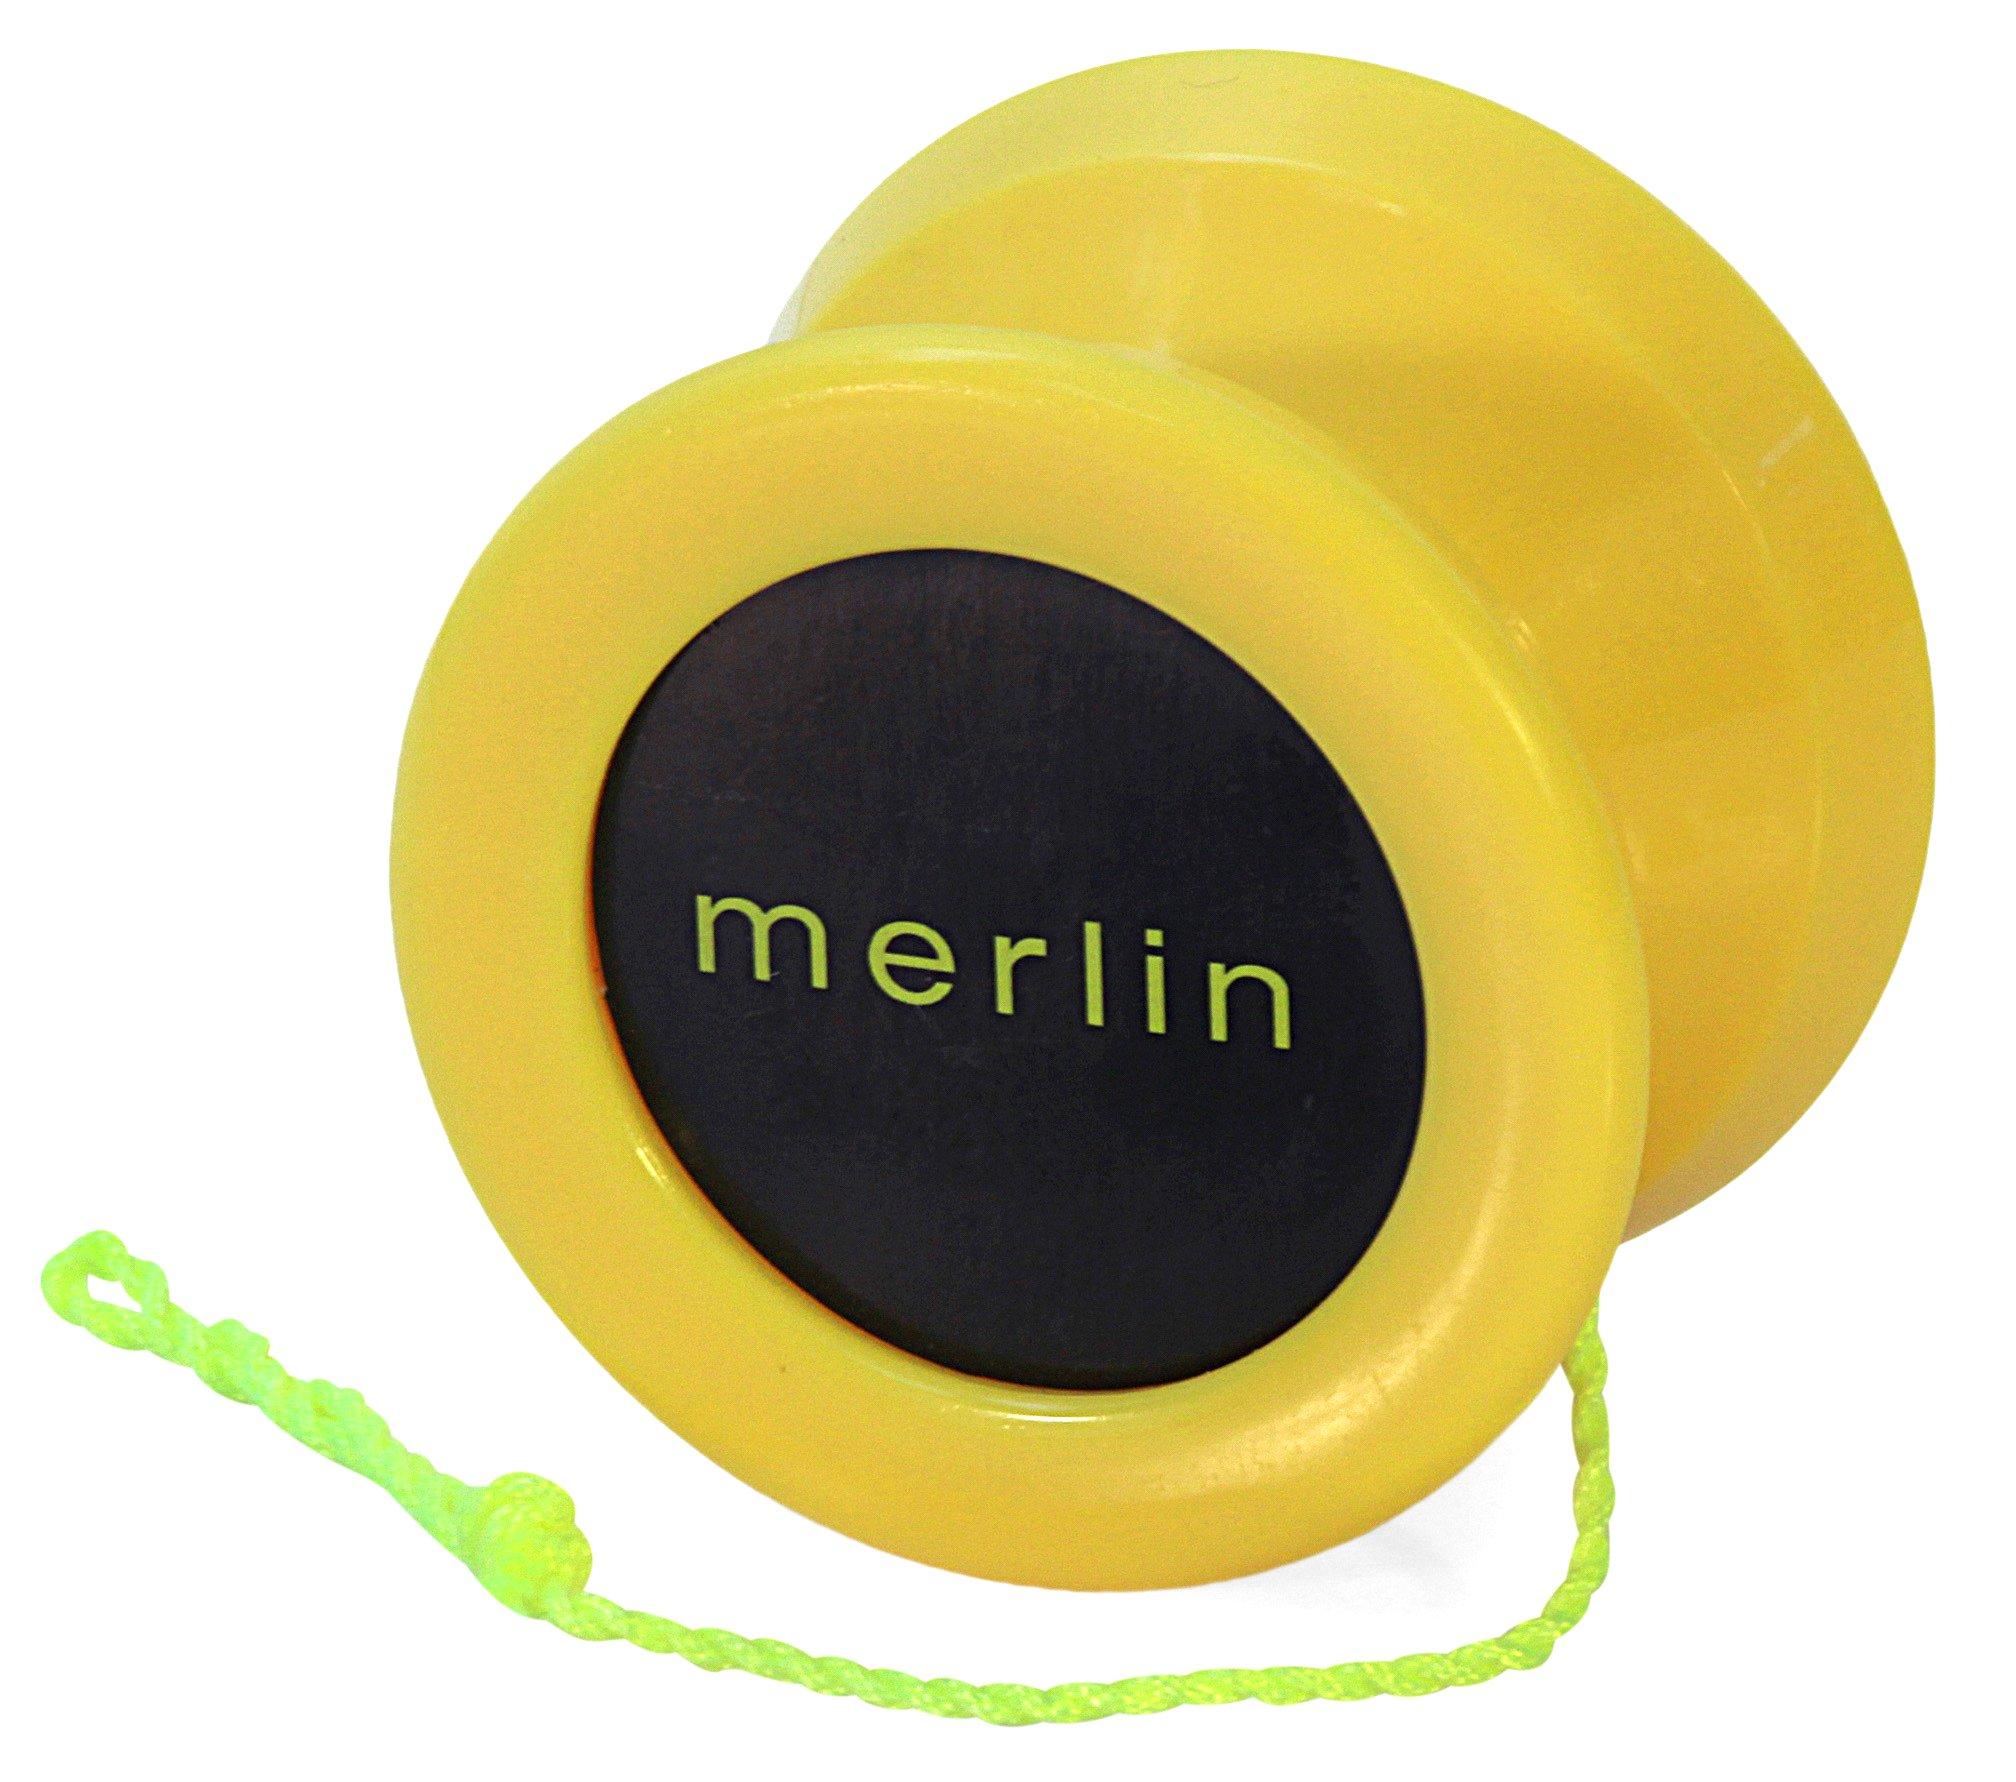 Yoyo King Yellow Merlin Professional Ball Bearing Axle Yoyo for Pro Tricks